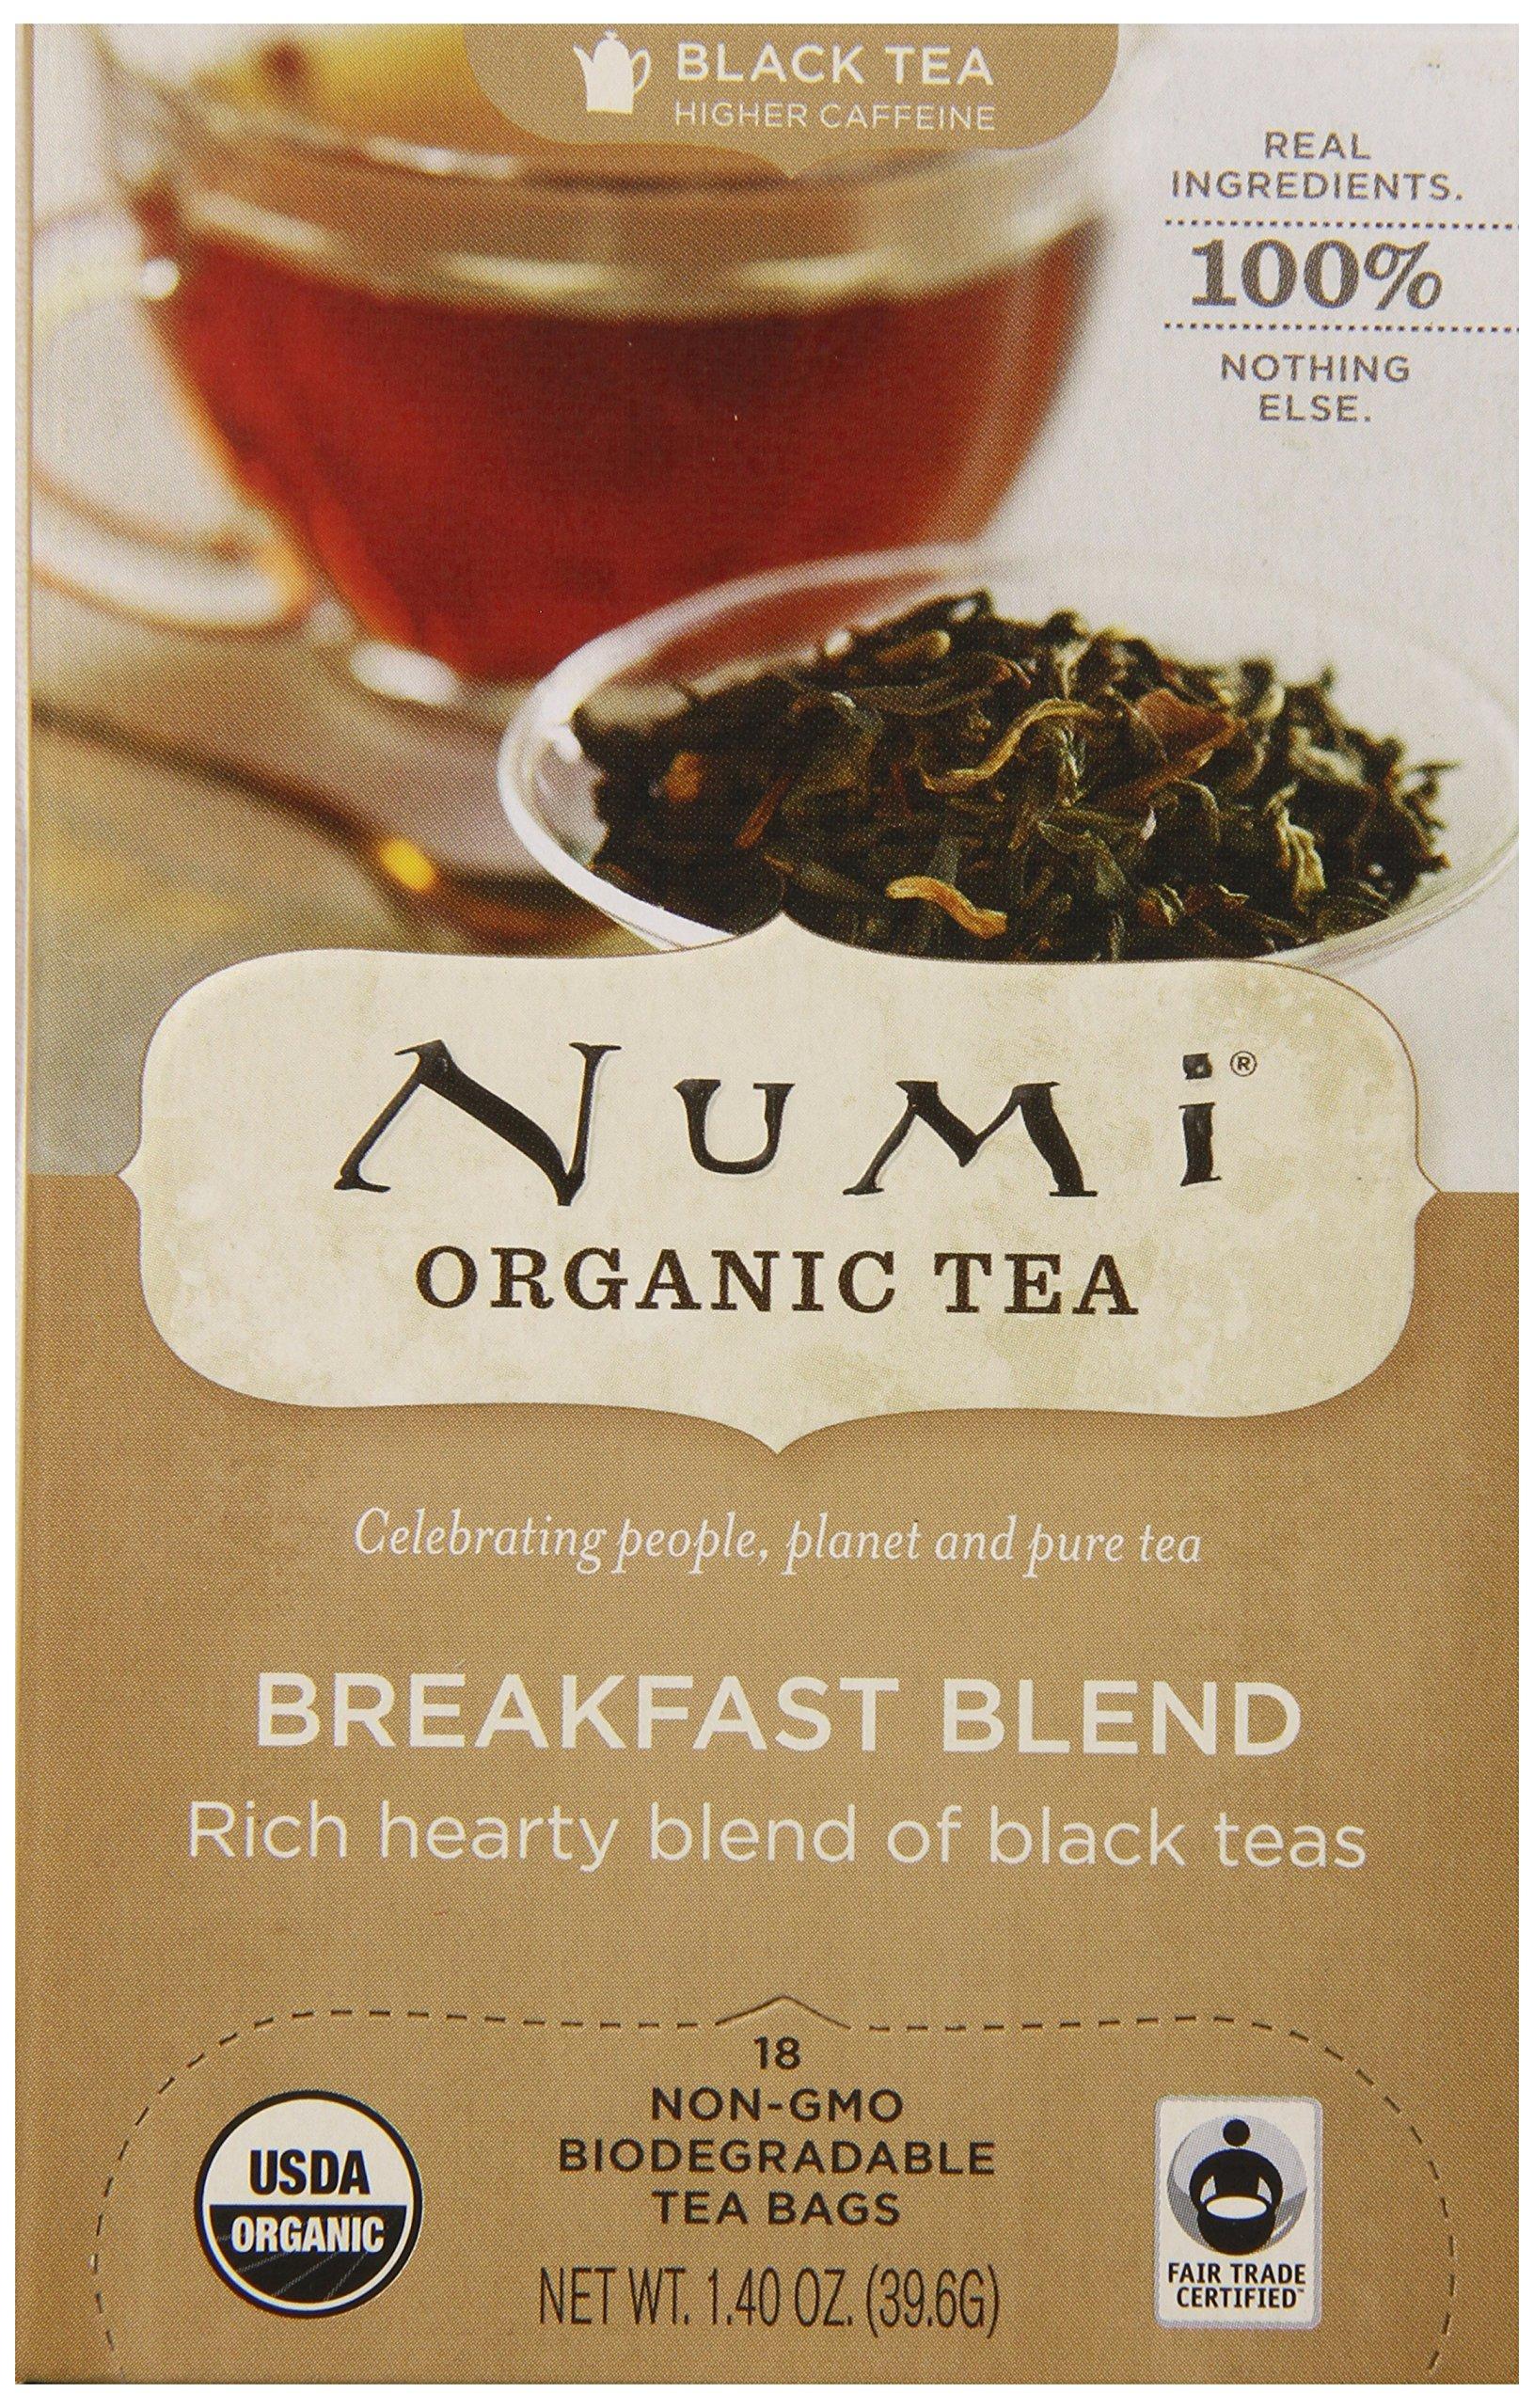 Numi Organic Tea Fair Trade Breakfast Blend  - Morning Rise - Full Leaf Black Tea in Teabags, 18-Count Box (Pack of 6)